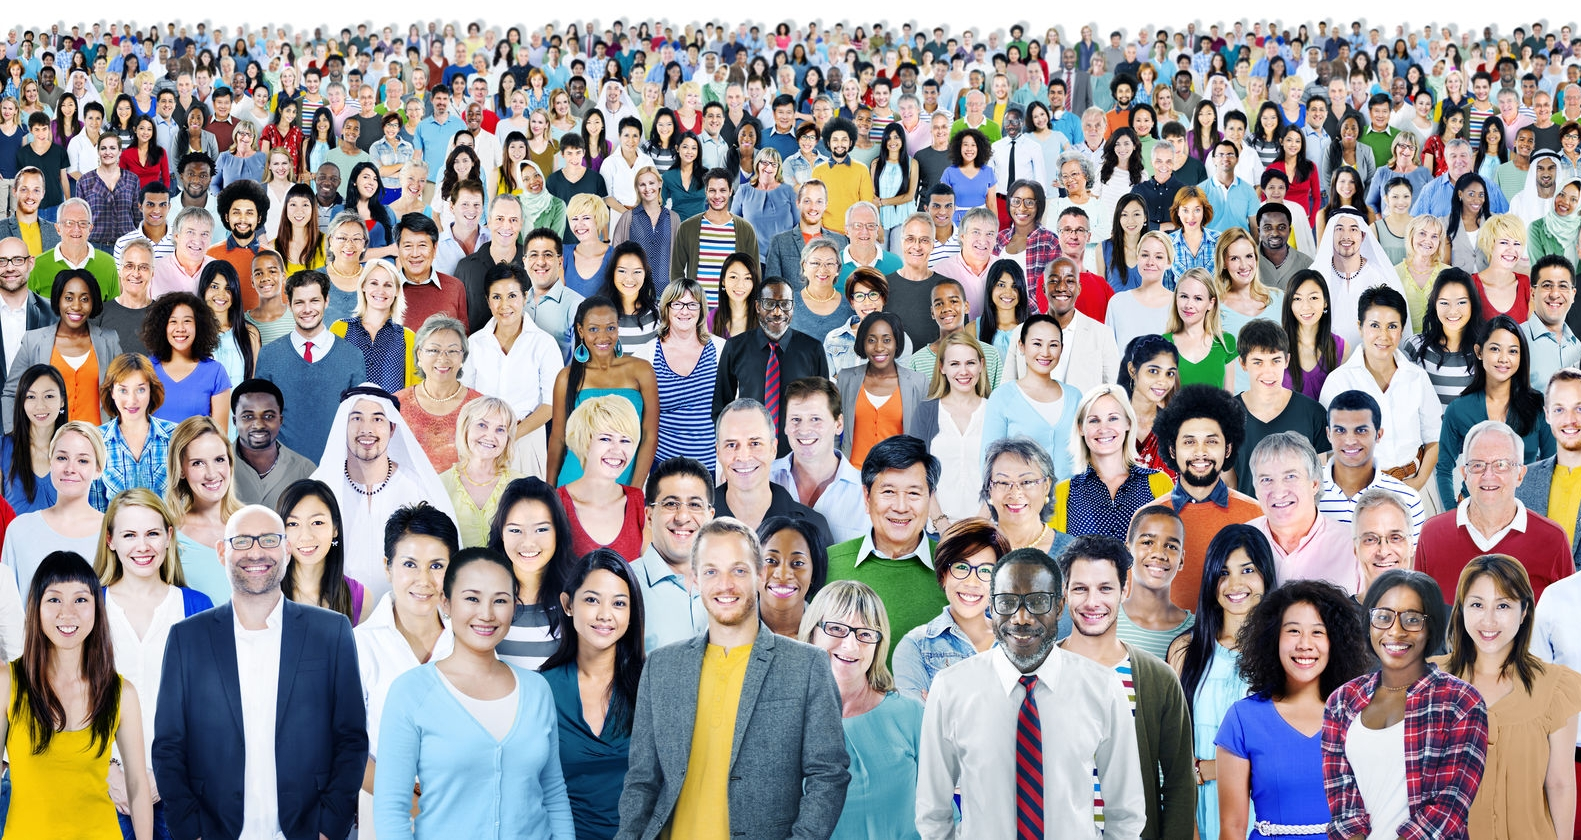 Belonging Matters - Belonging leads to believing